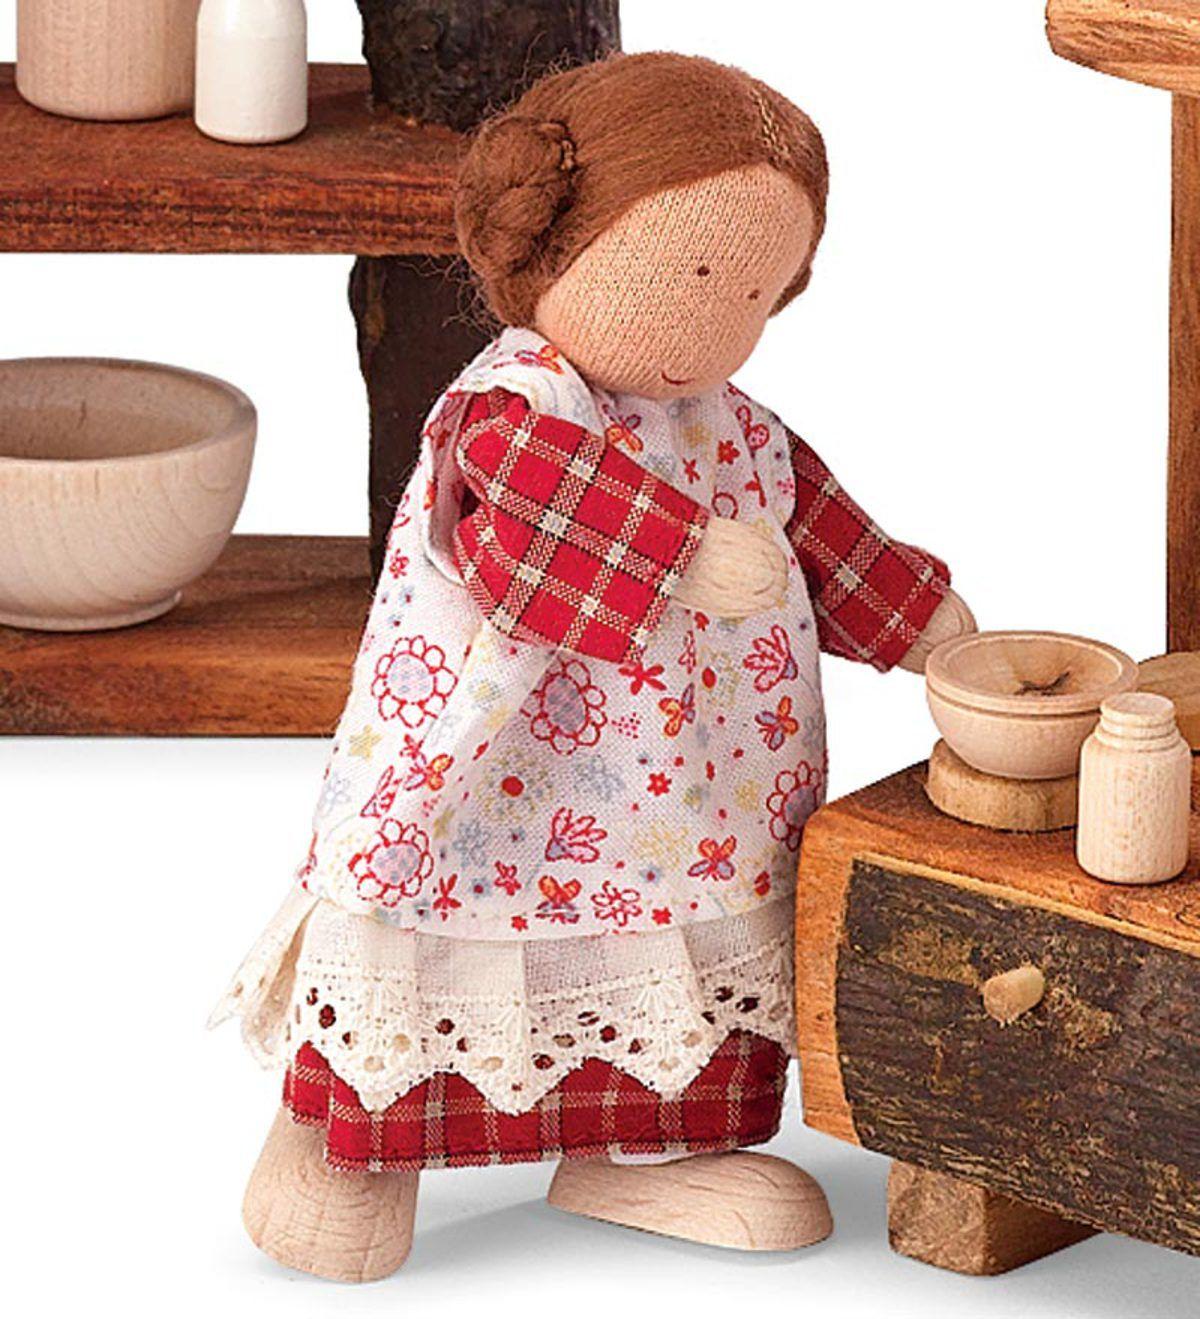 Pioneer Dollhouse Magic Cabin Dolls Dollhouse Dolls Magiccabin Dollhouse Dolls My Life Doll Accessories Barbie Doll Accessories